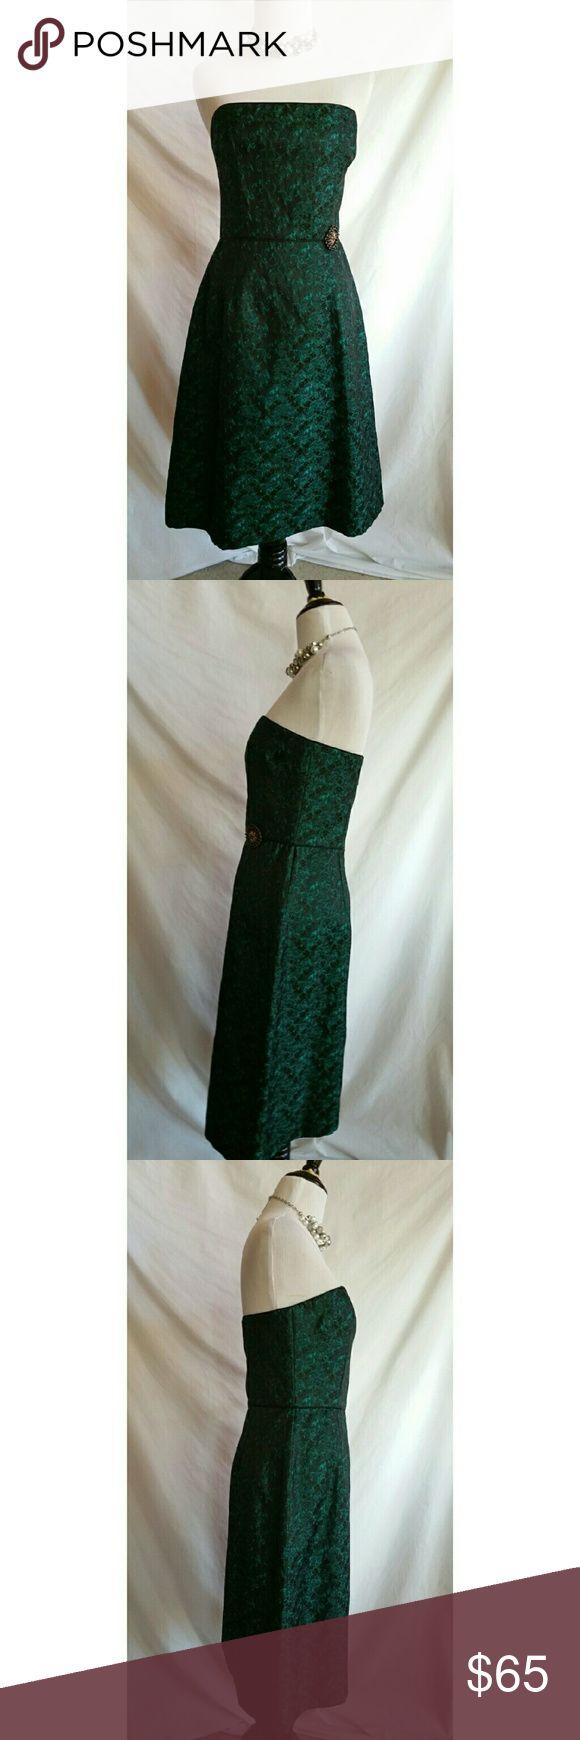 Laundry Shelli Segal Size 8 Strapless Dress Cocktail,  evening dress.  Back zipper.  Acetate,  polyester.   Acetate lining.   Stunning,  high quality dress! Laundry by Shelli Segal Dresses